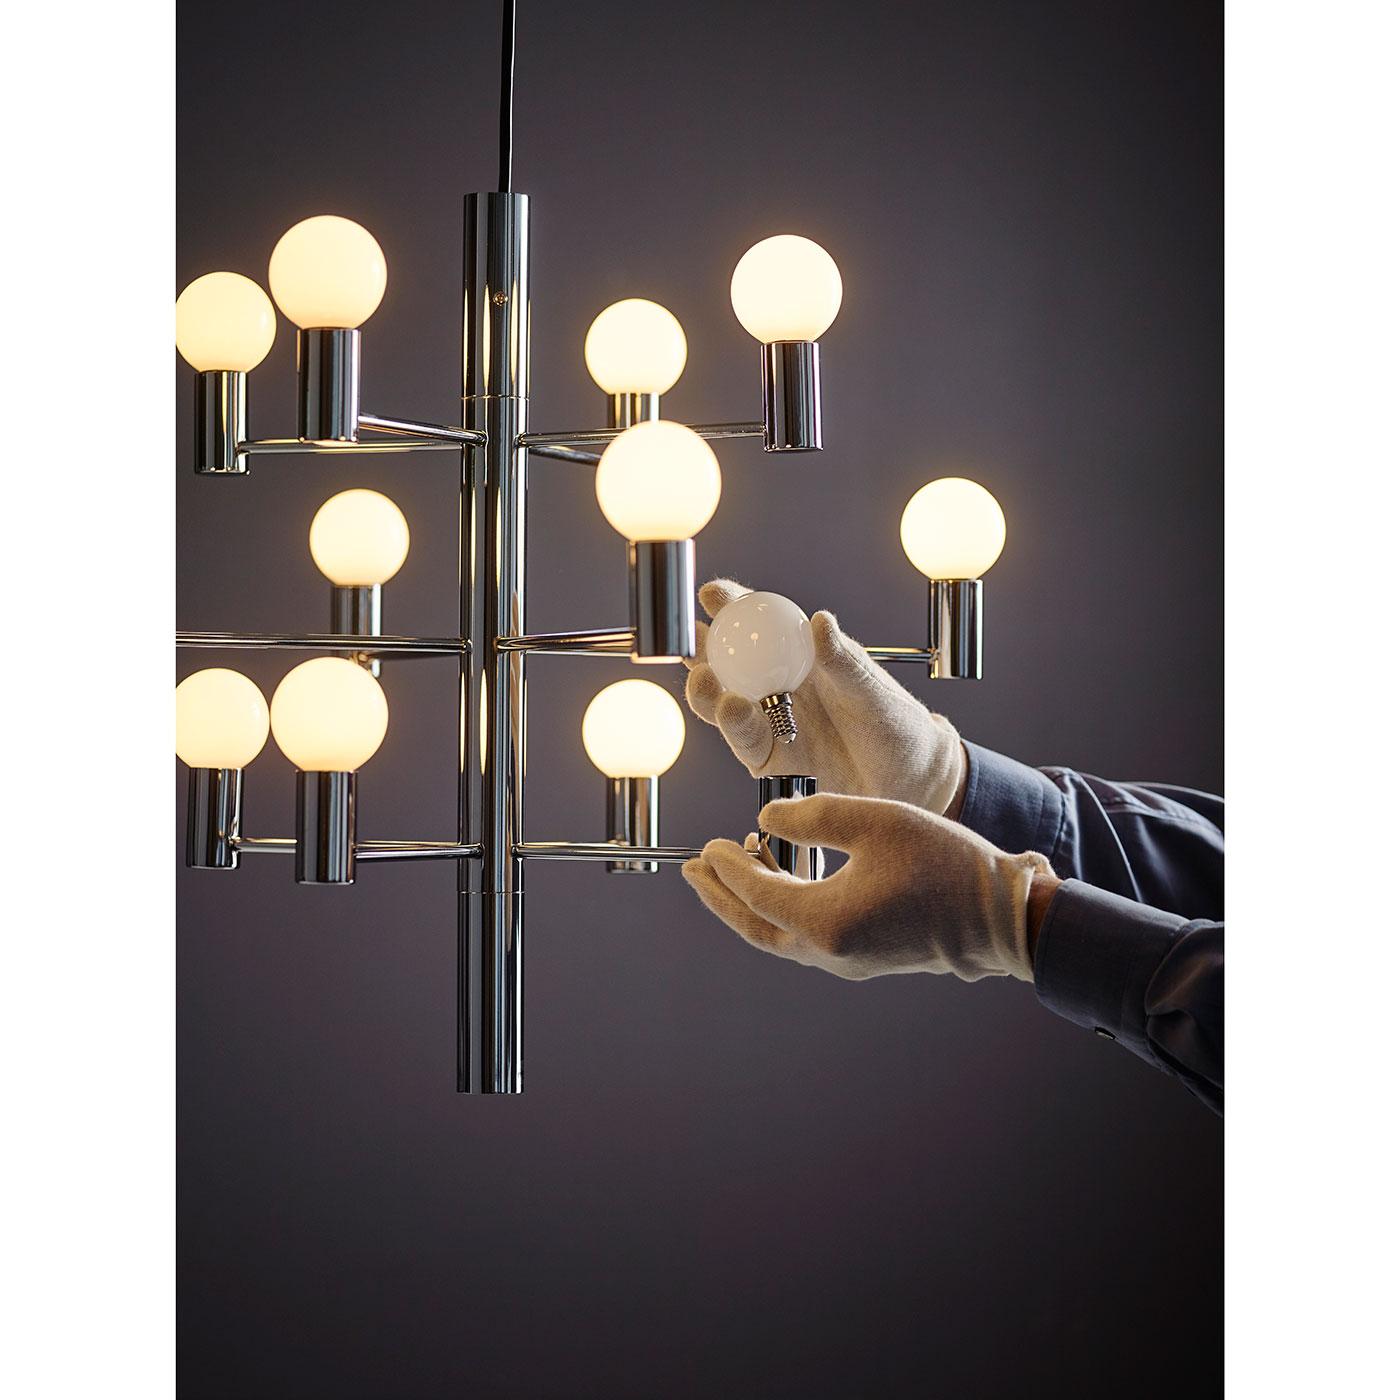 Herstal Manola 12 Dimbar LED Ljuskrona Svart